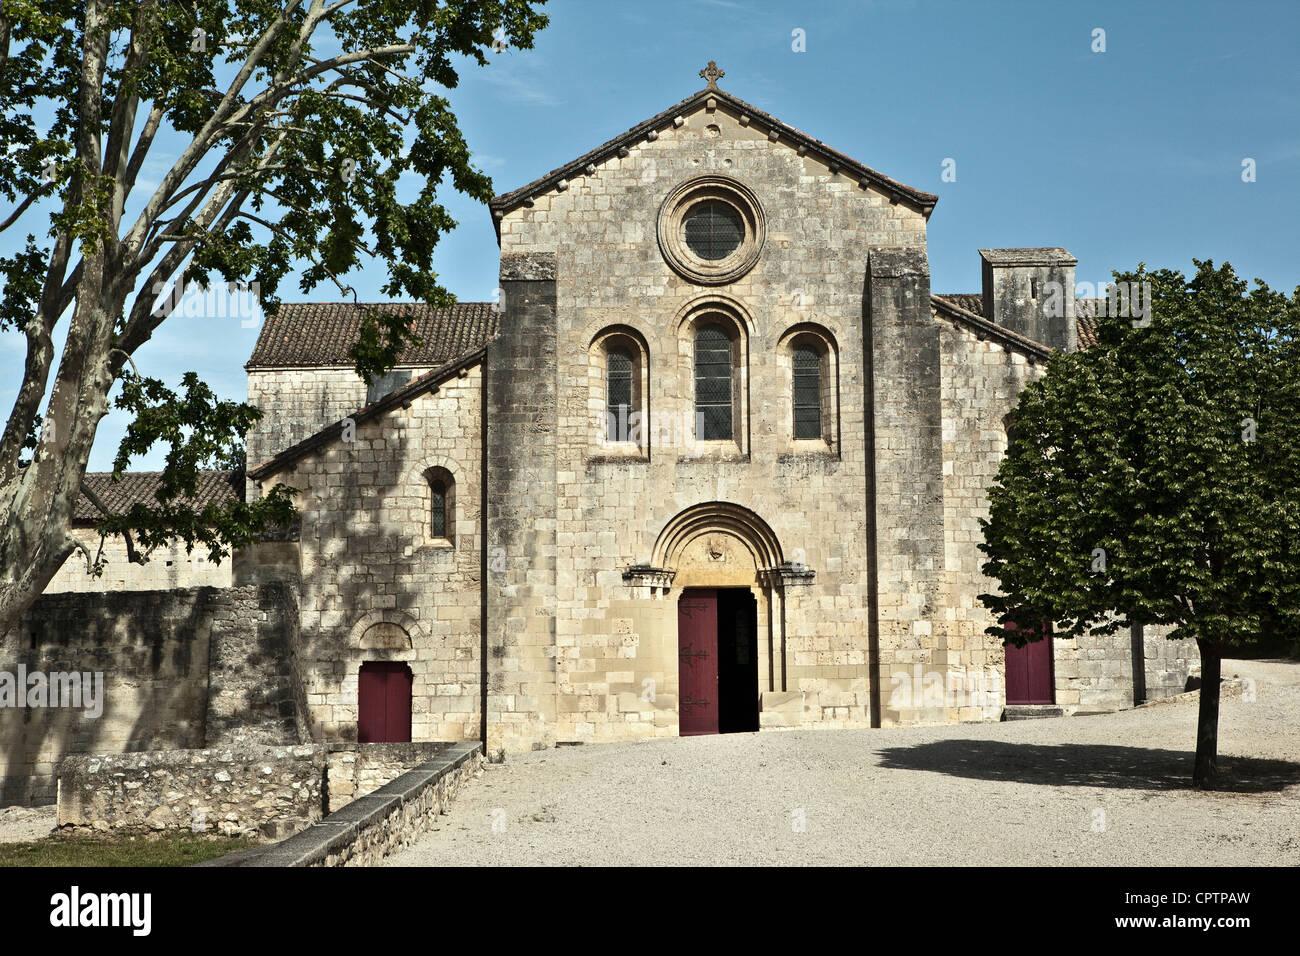 The Cistercian abbey of Silvacane (Provence,France) Stock Photo